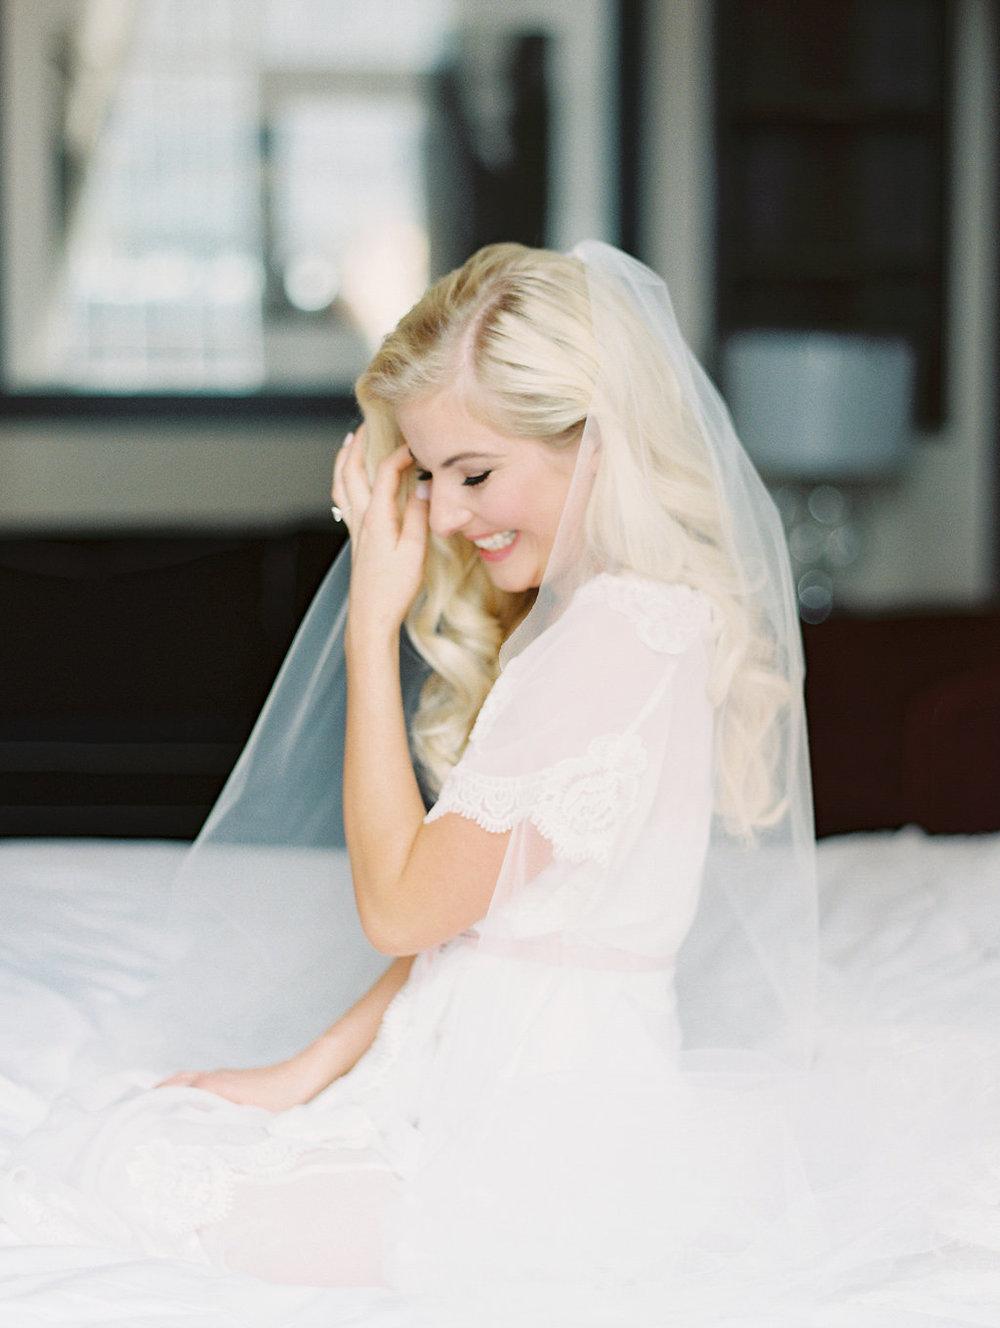 bride-on-her-wedding-day